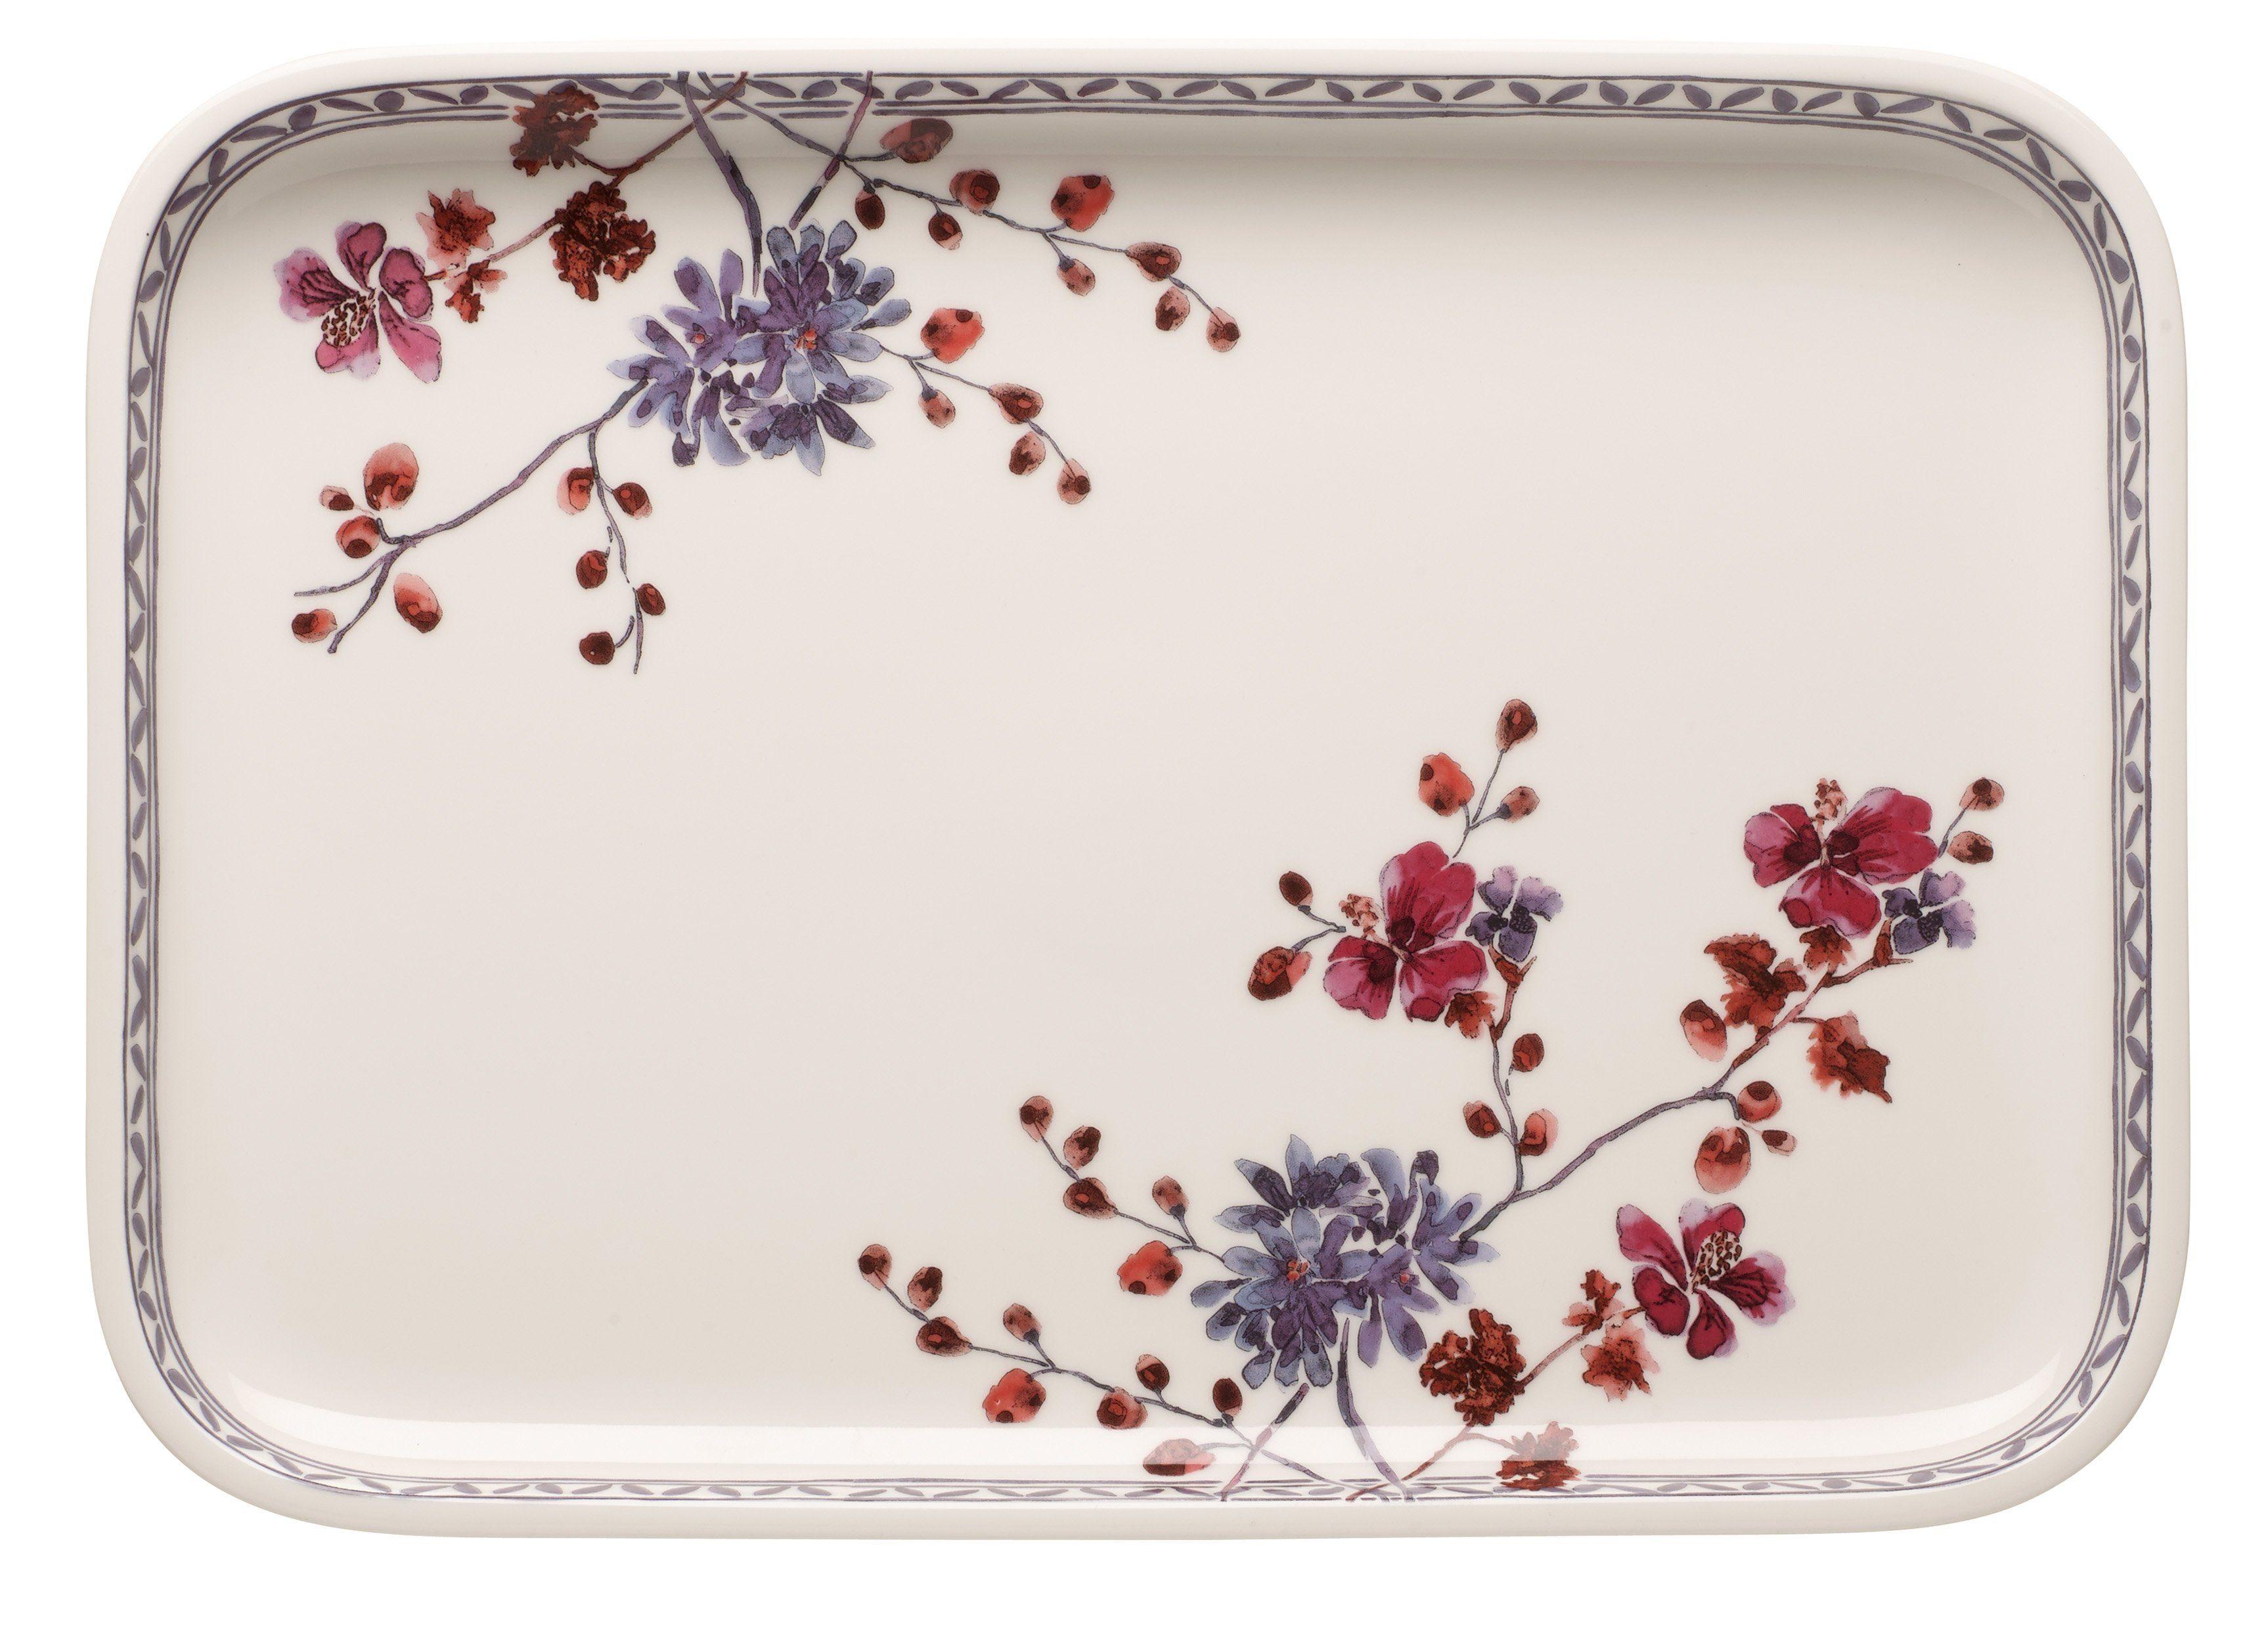 Villeroy & Boch Servierplatte rechteckig »Artesano Provençal Lavendel Backformen«